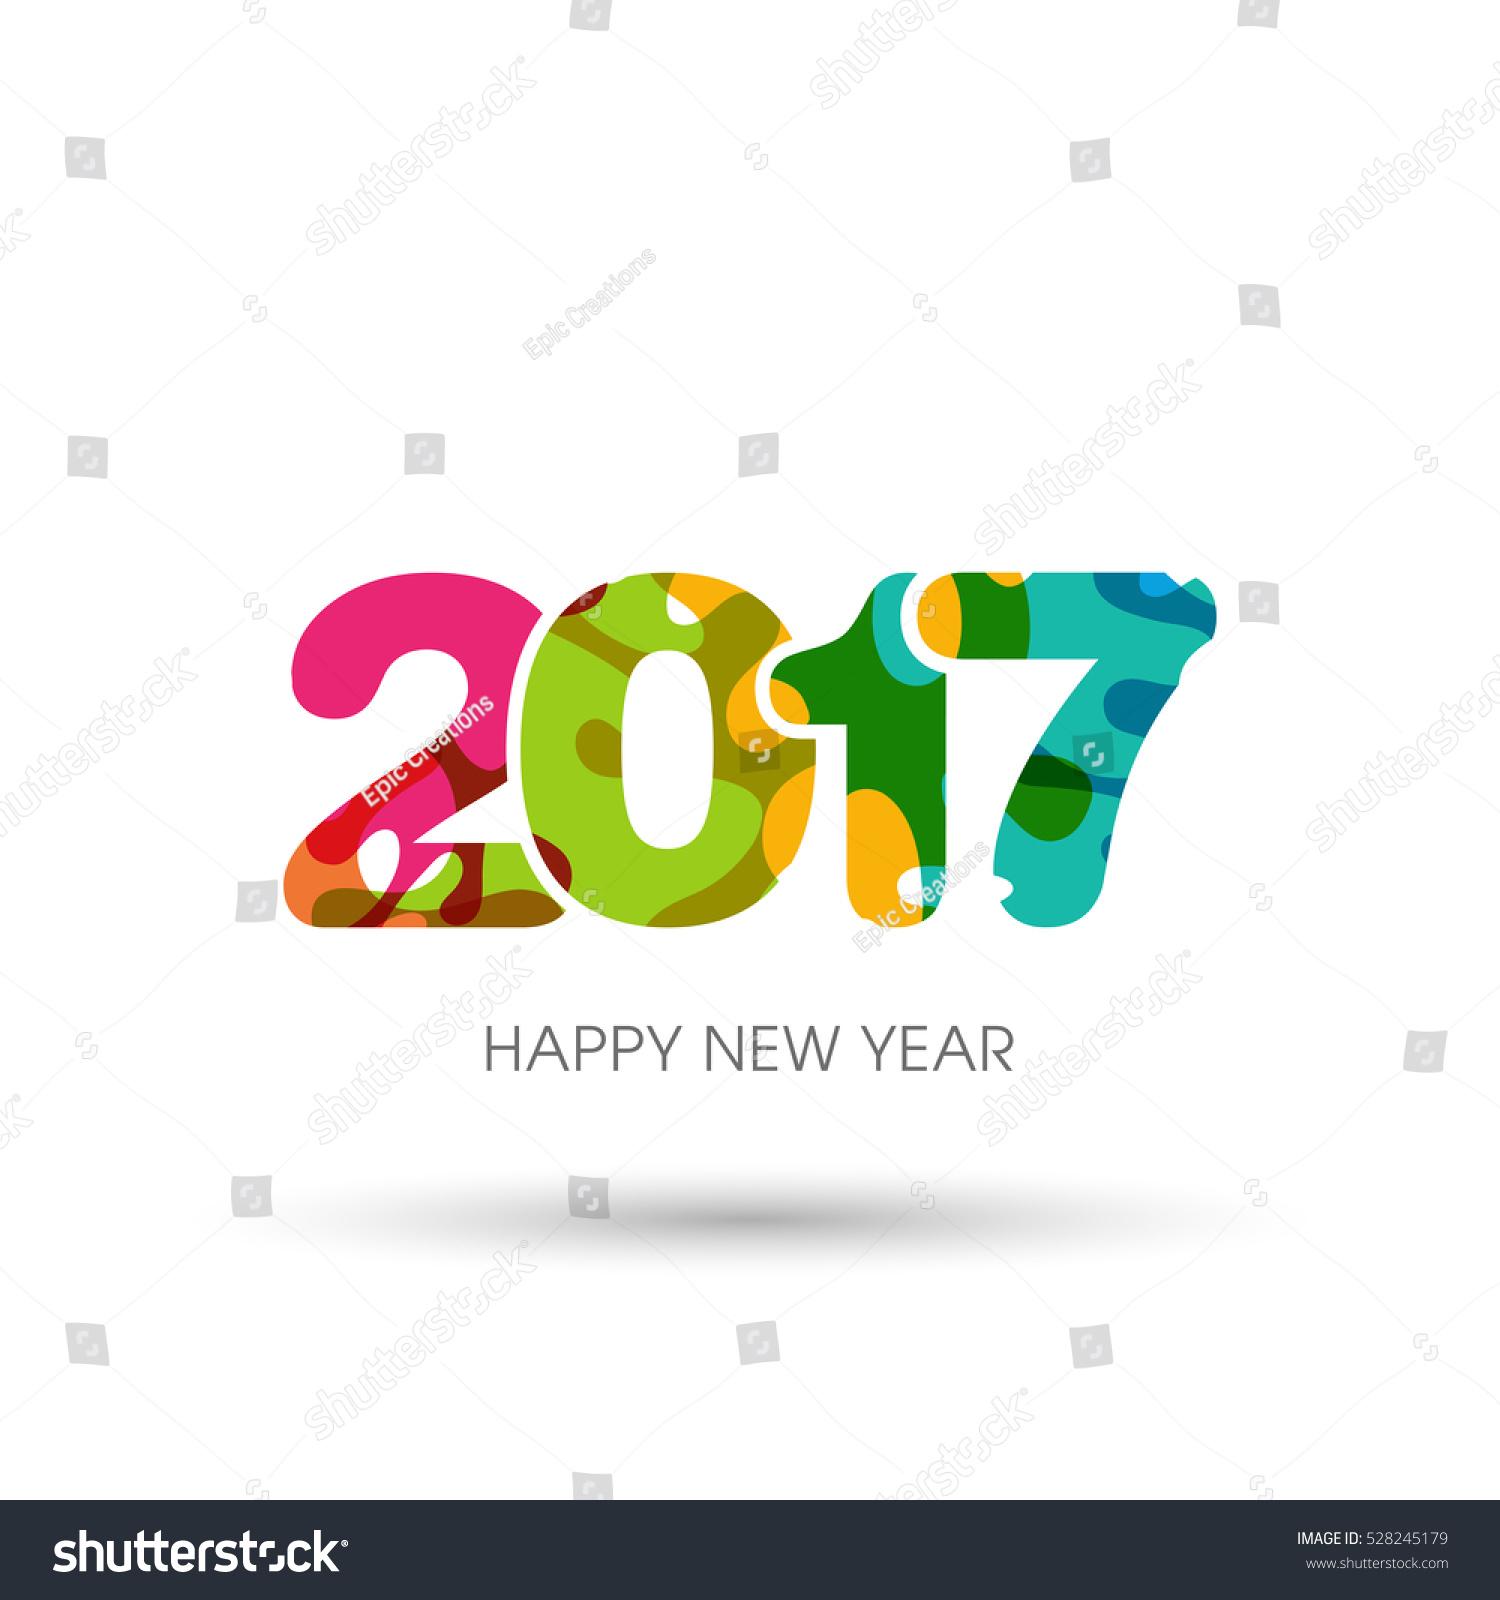 Happy New Year 2017 Text Design Stock Vector 528245179 ...